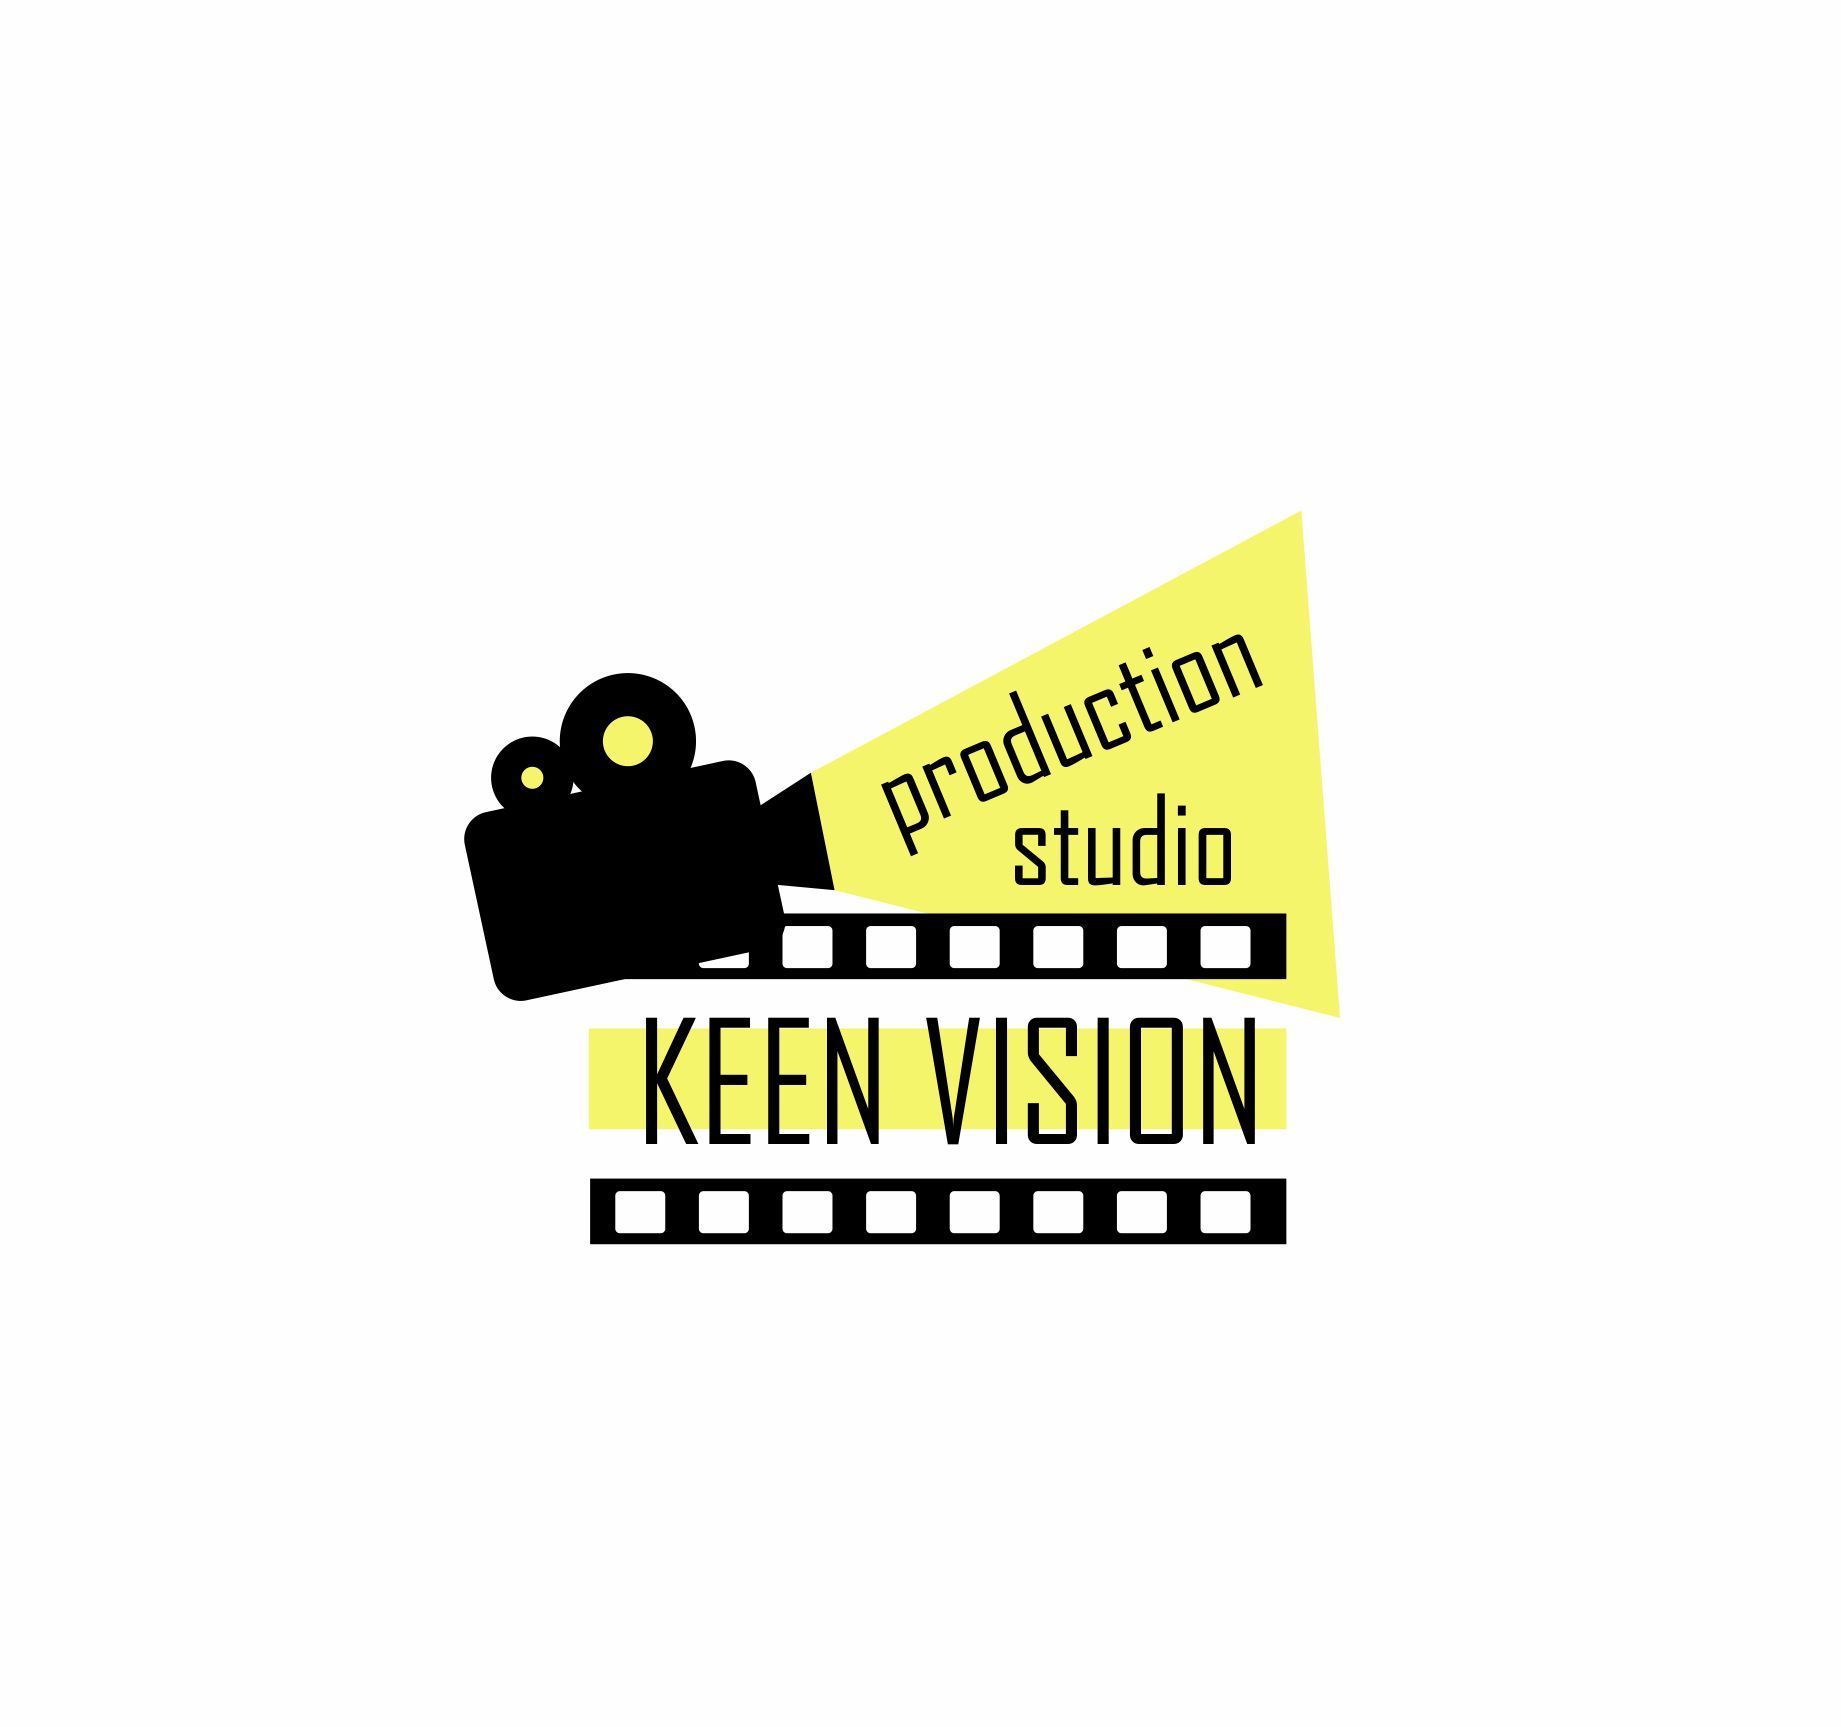 Логотип для KeenVision - дизайнер sentjabrina30